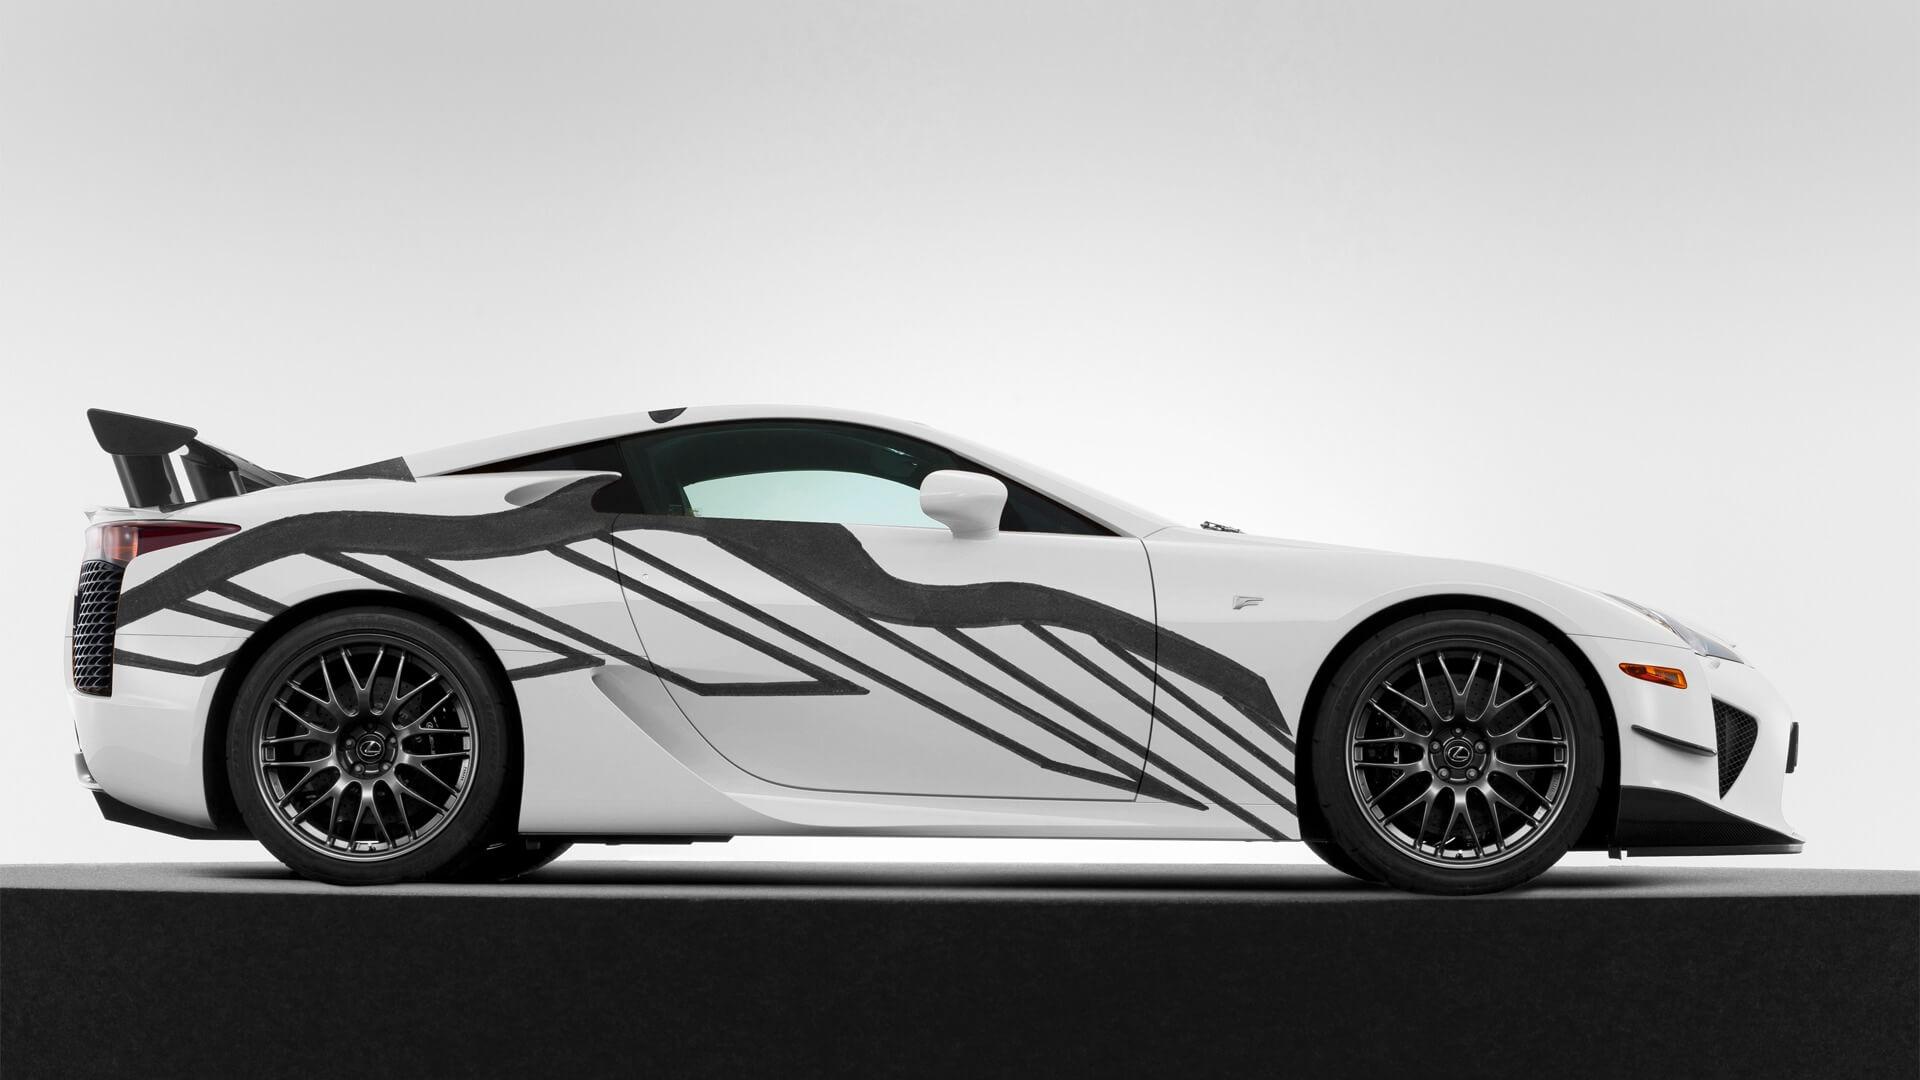 Lfa 24 Hours Spa Lexus Europe